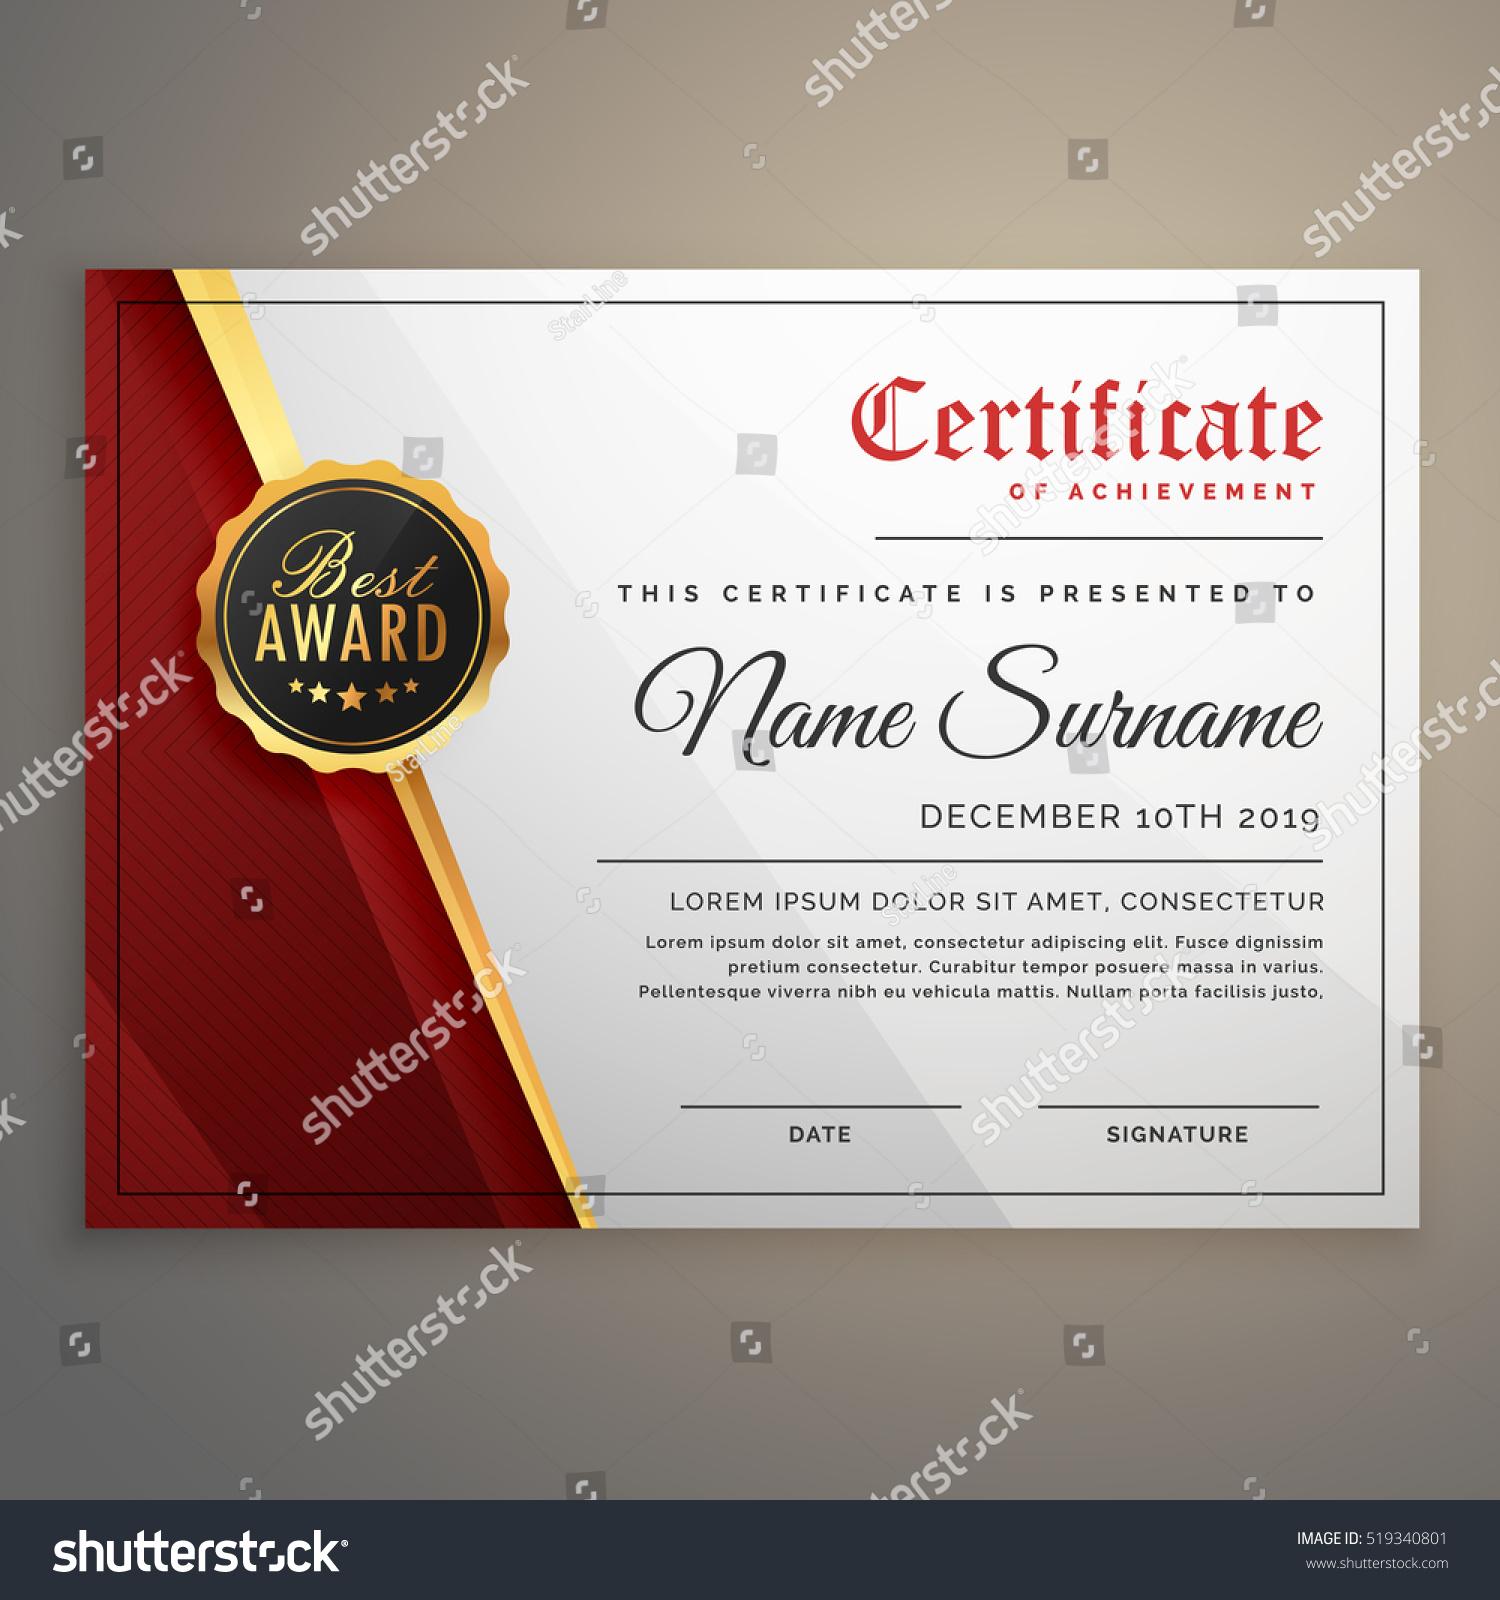 Award Winning Typography Examples